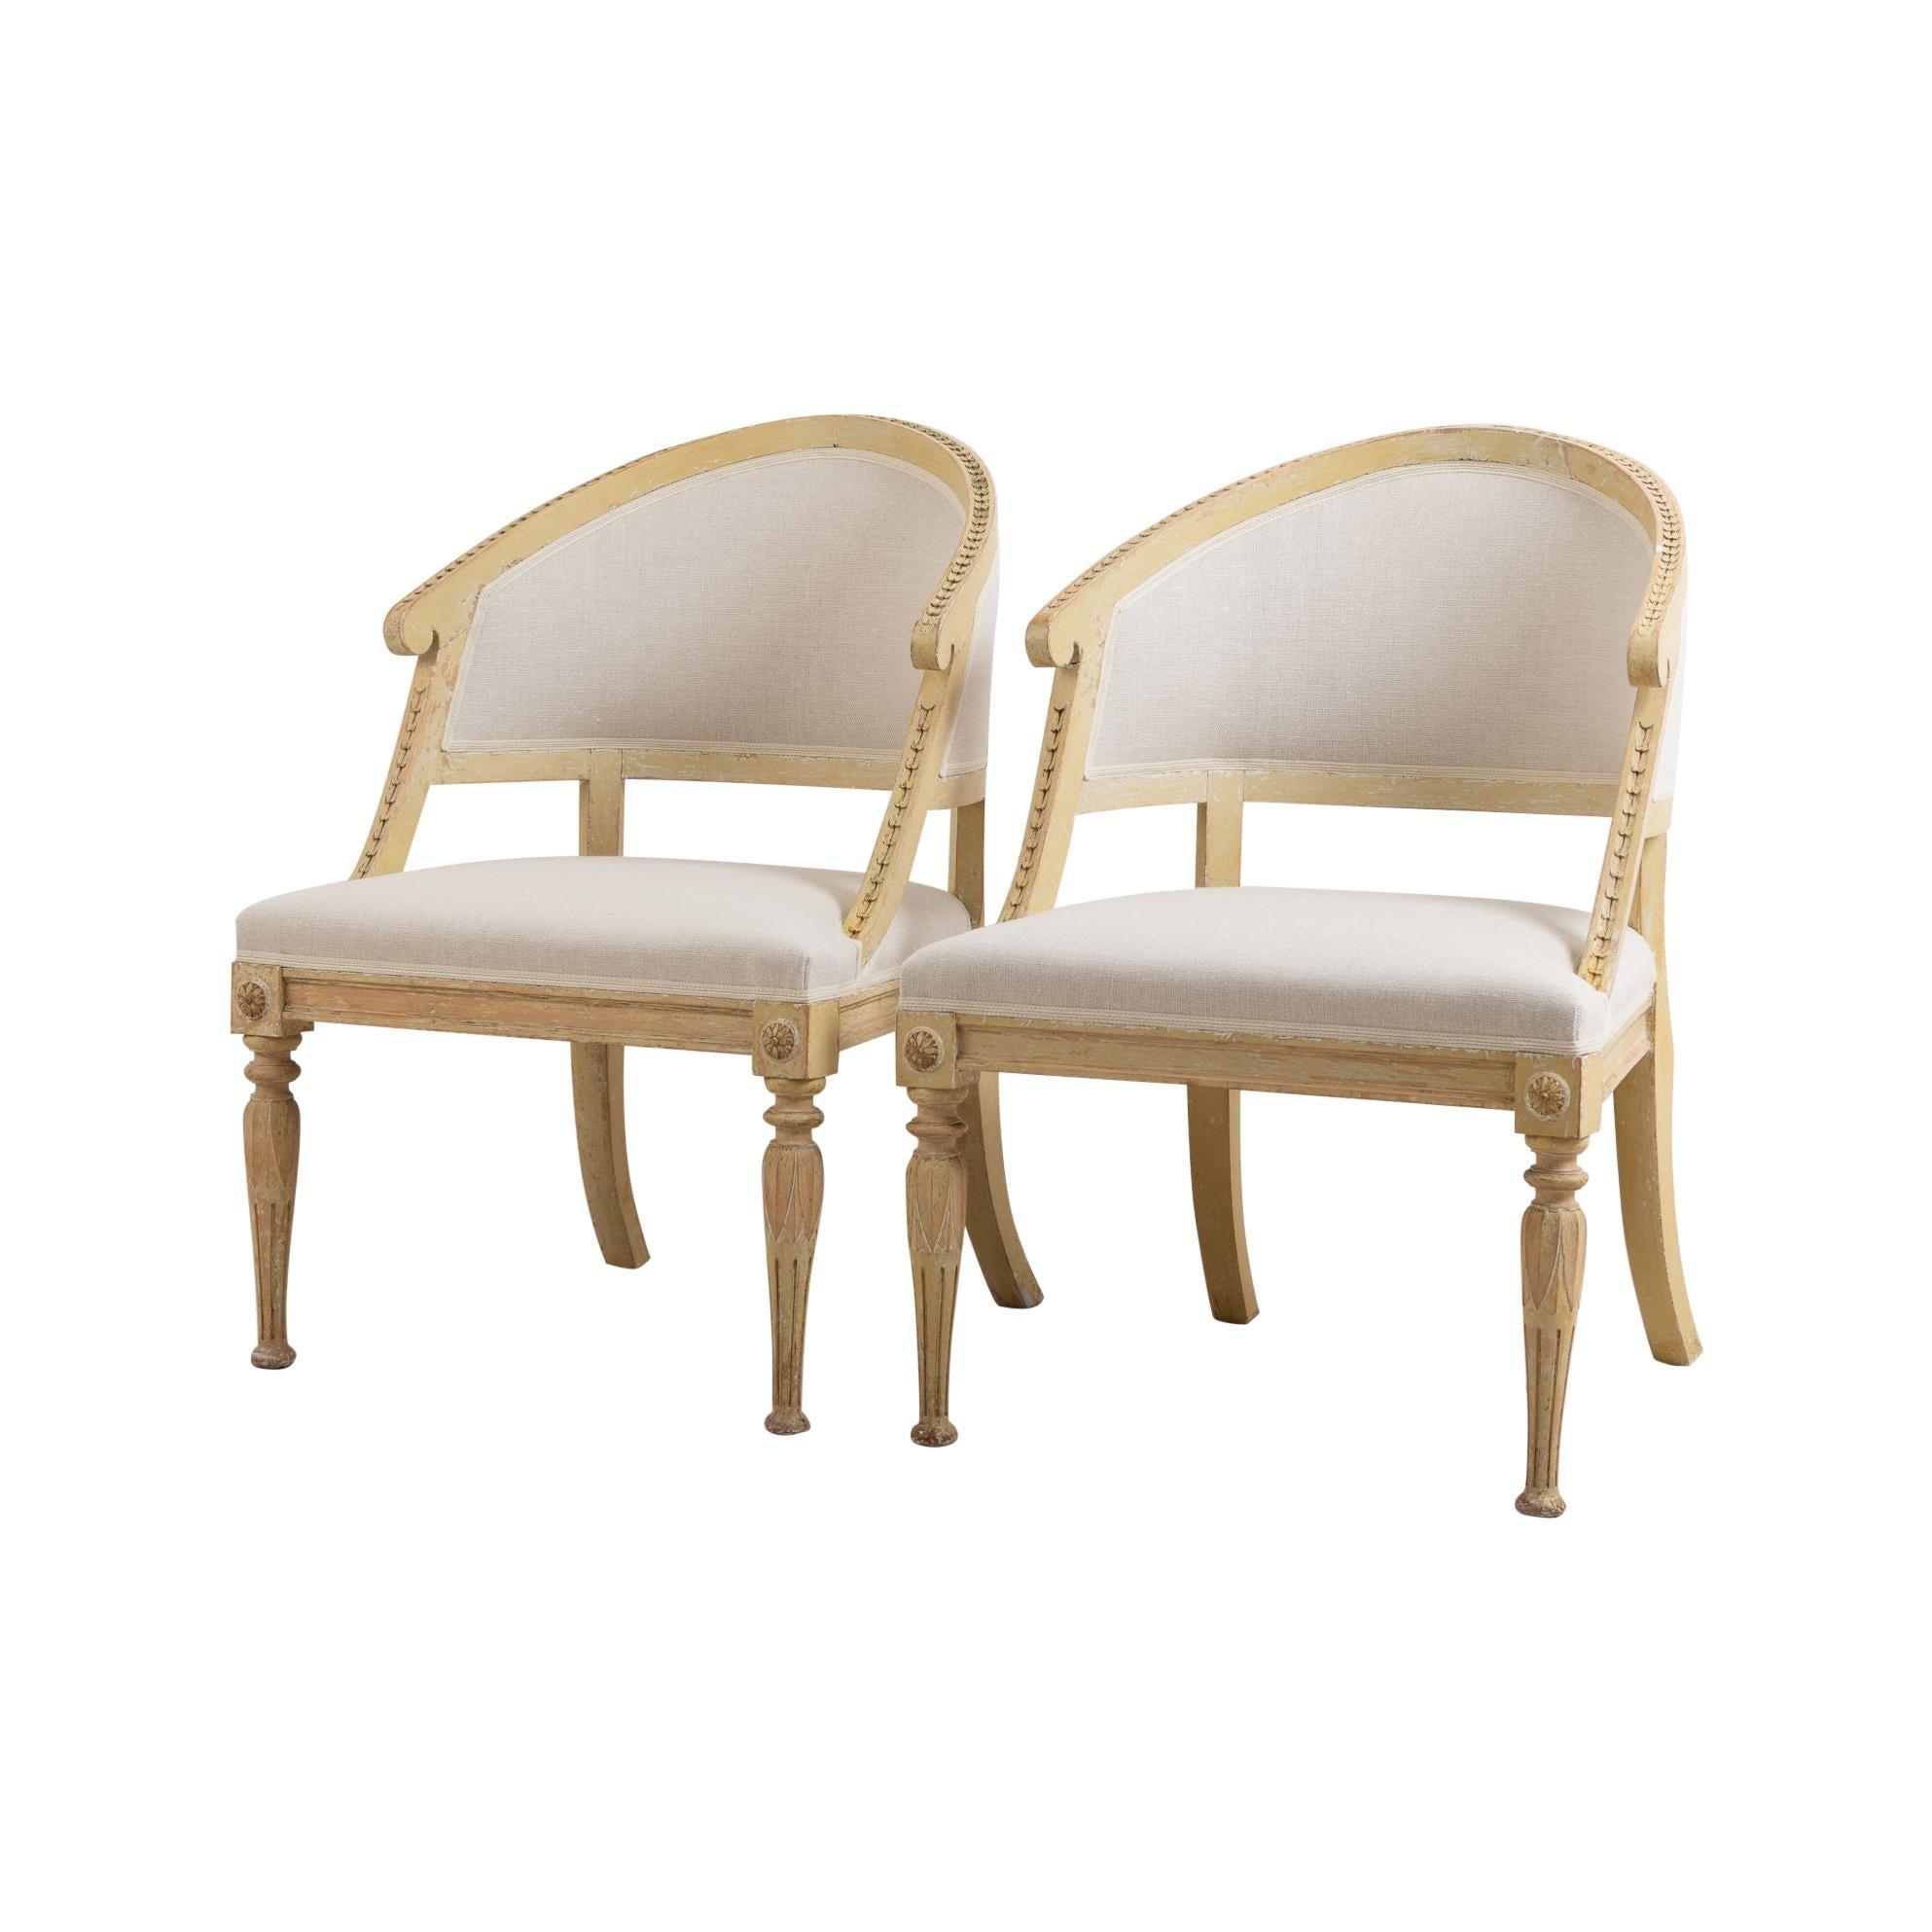 19th Century Swedish Gustavian Style Barrel Back Chairs